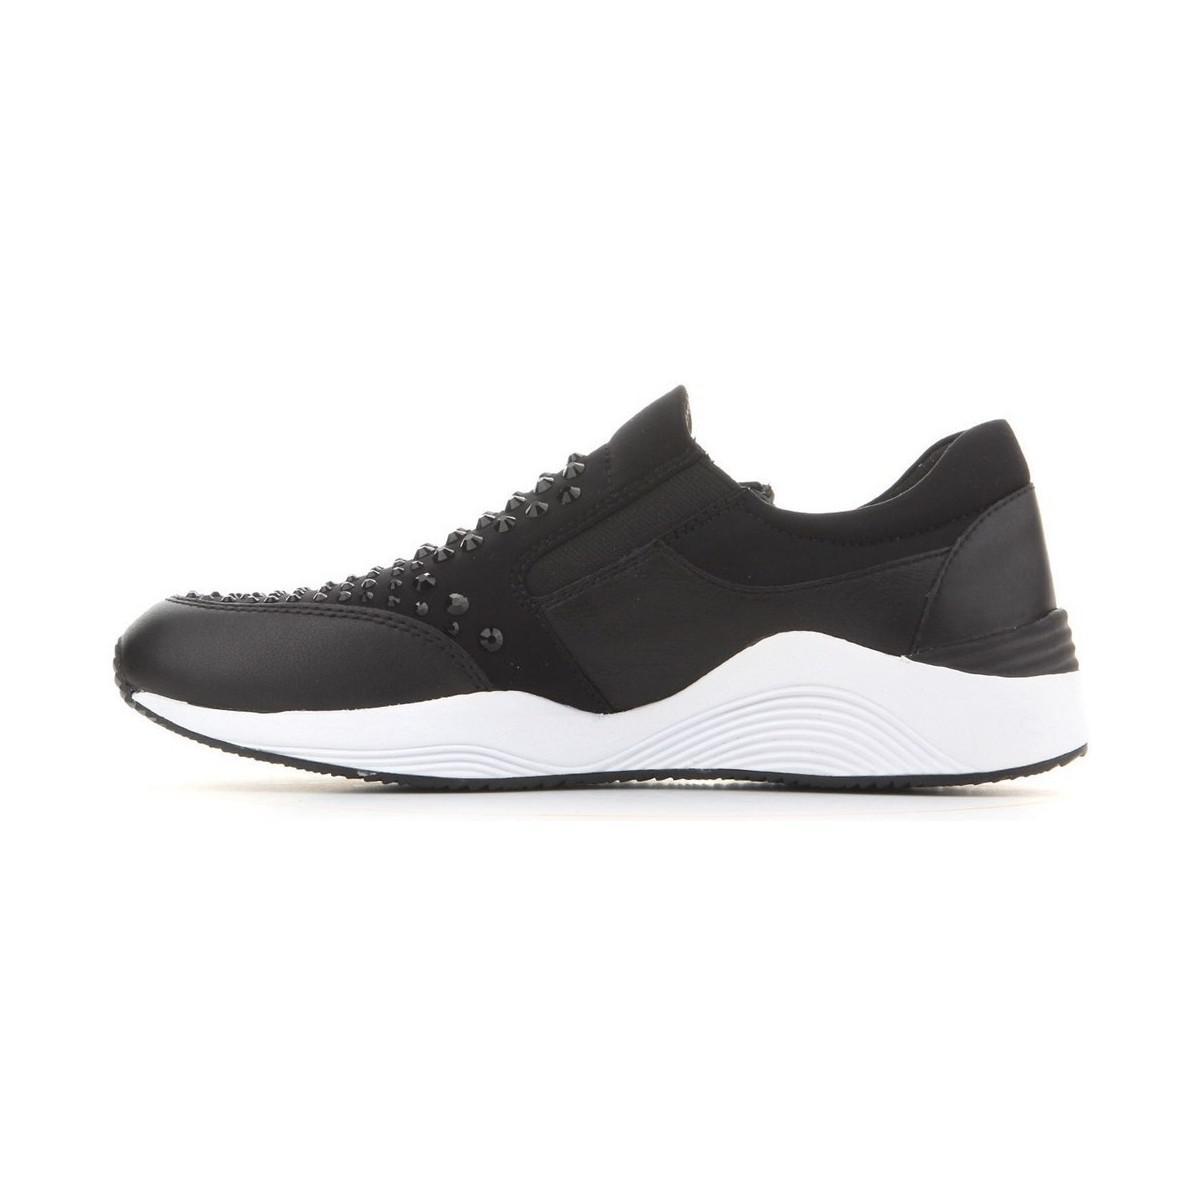 Geox Wmns D Omaya D640sc-01585-c0539 Women's Shoes (trainers) In Black